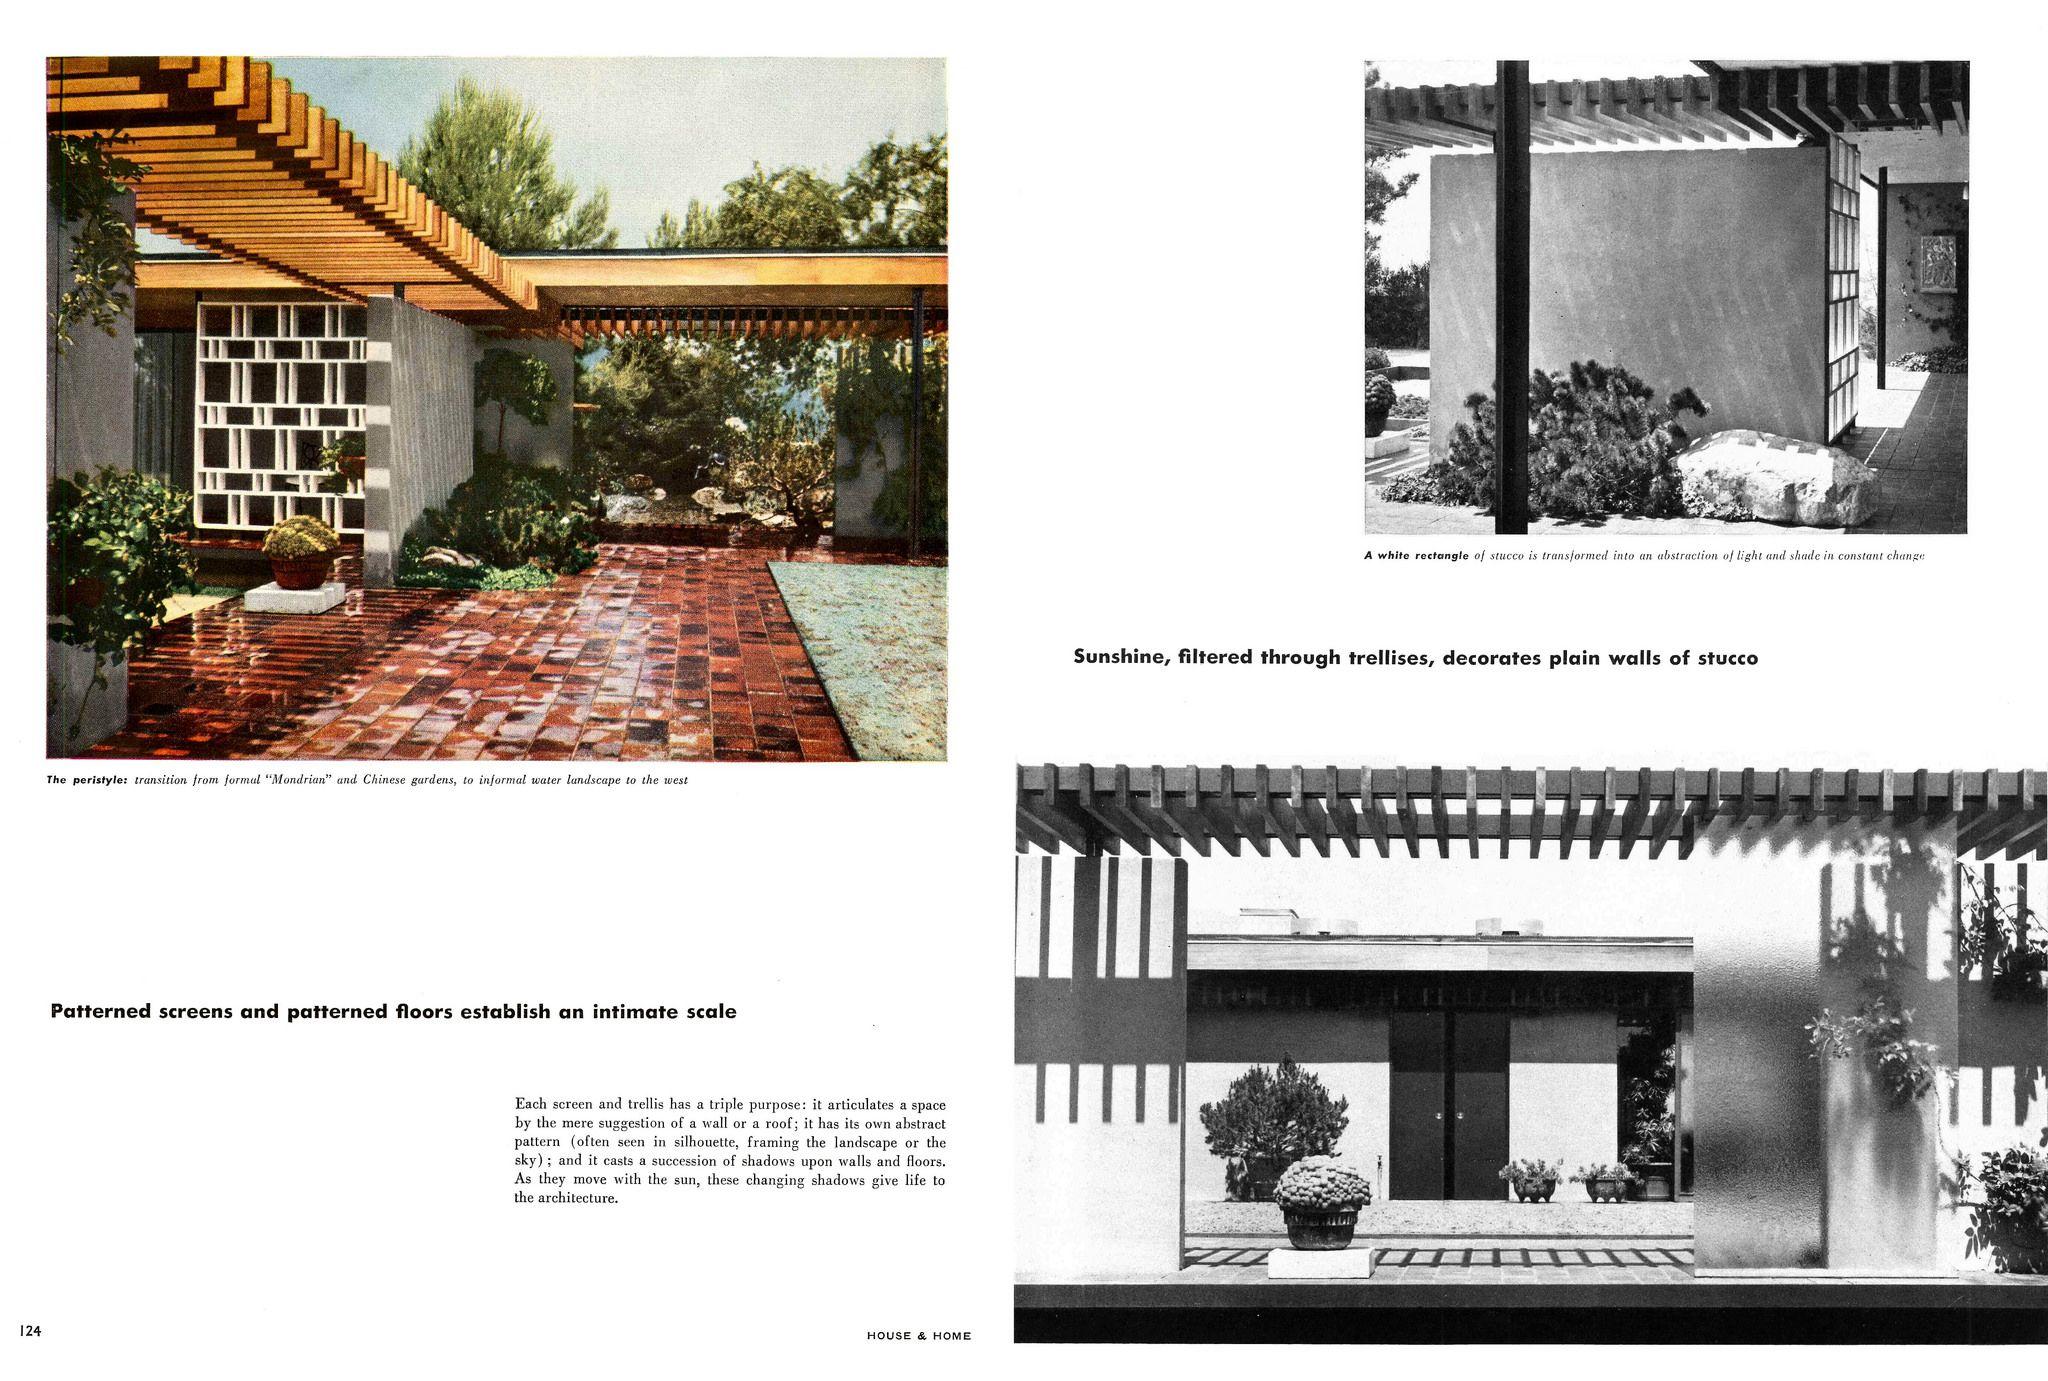 Thornton Ladd Lillian B Ladd Residence Hilltop House 1085 Glen Oaks Blvd Pasadena Ca 1951 Page 4 Of 6 Arch House House Residences